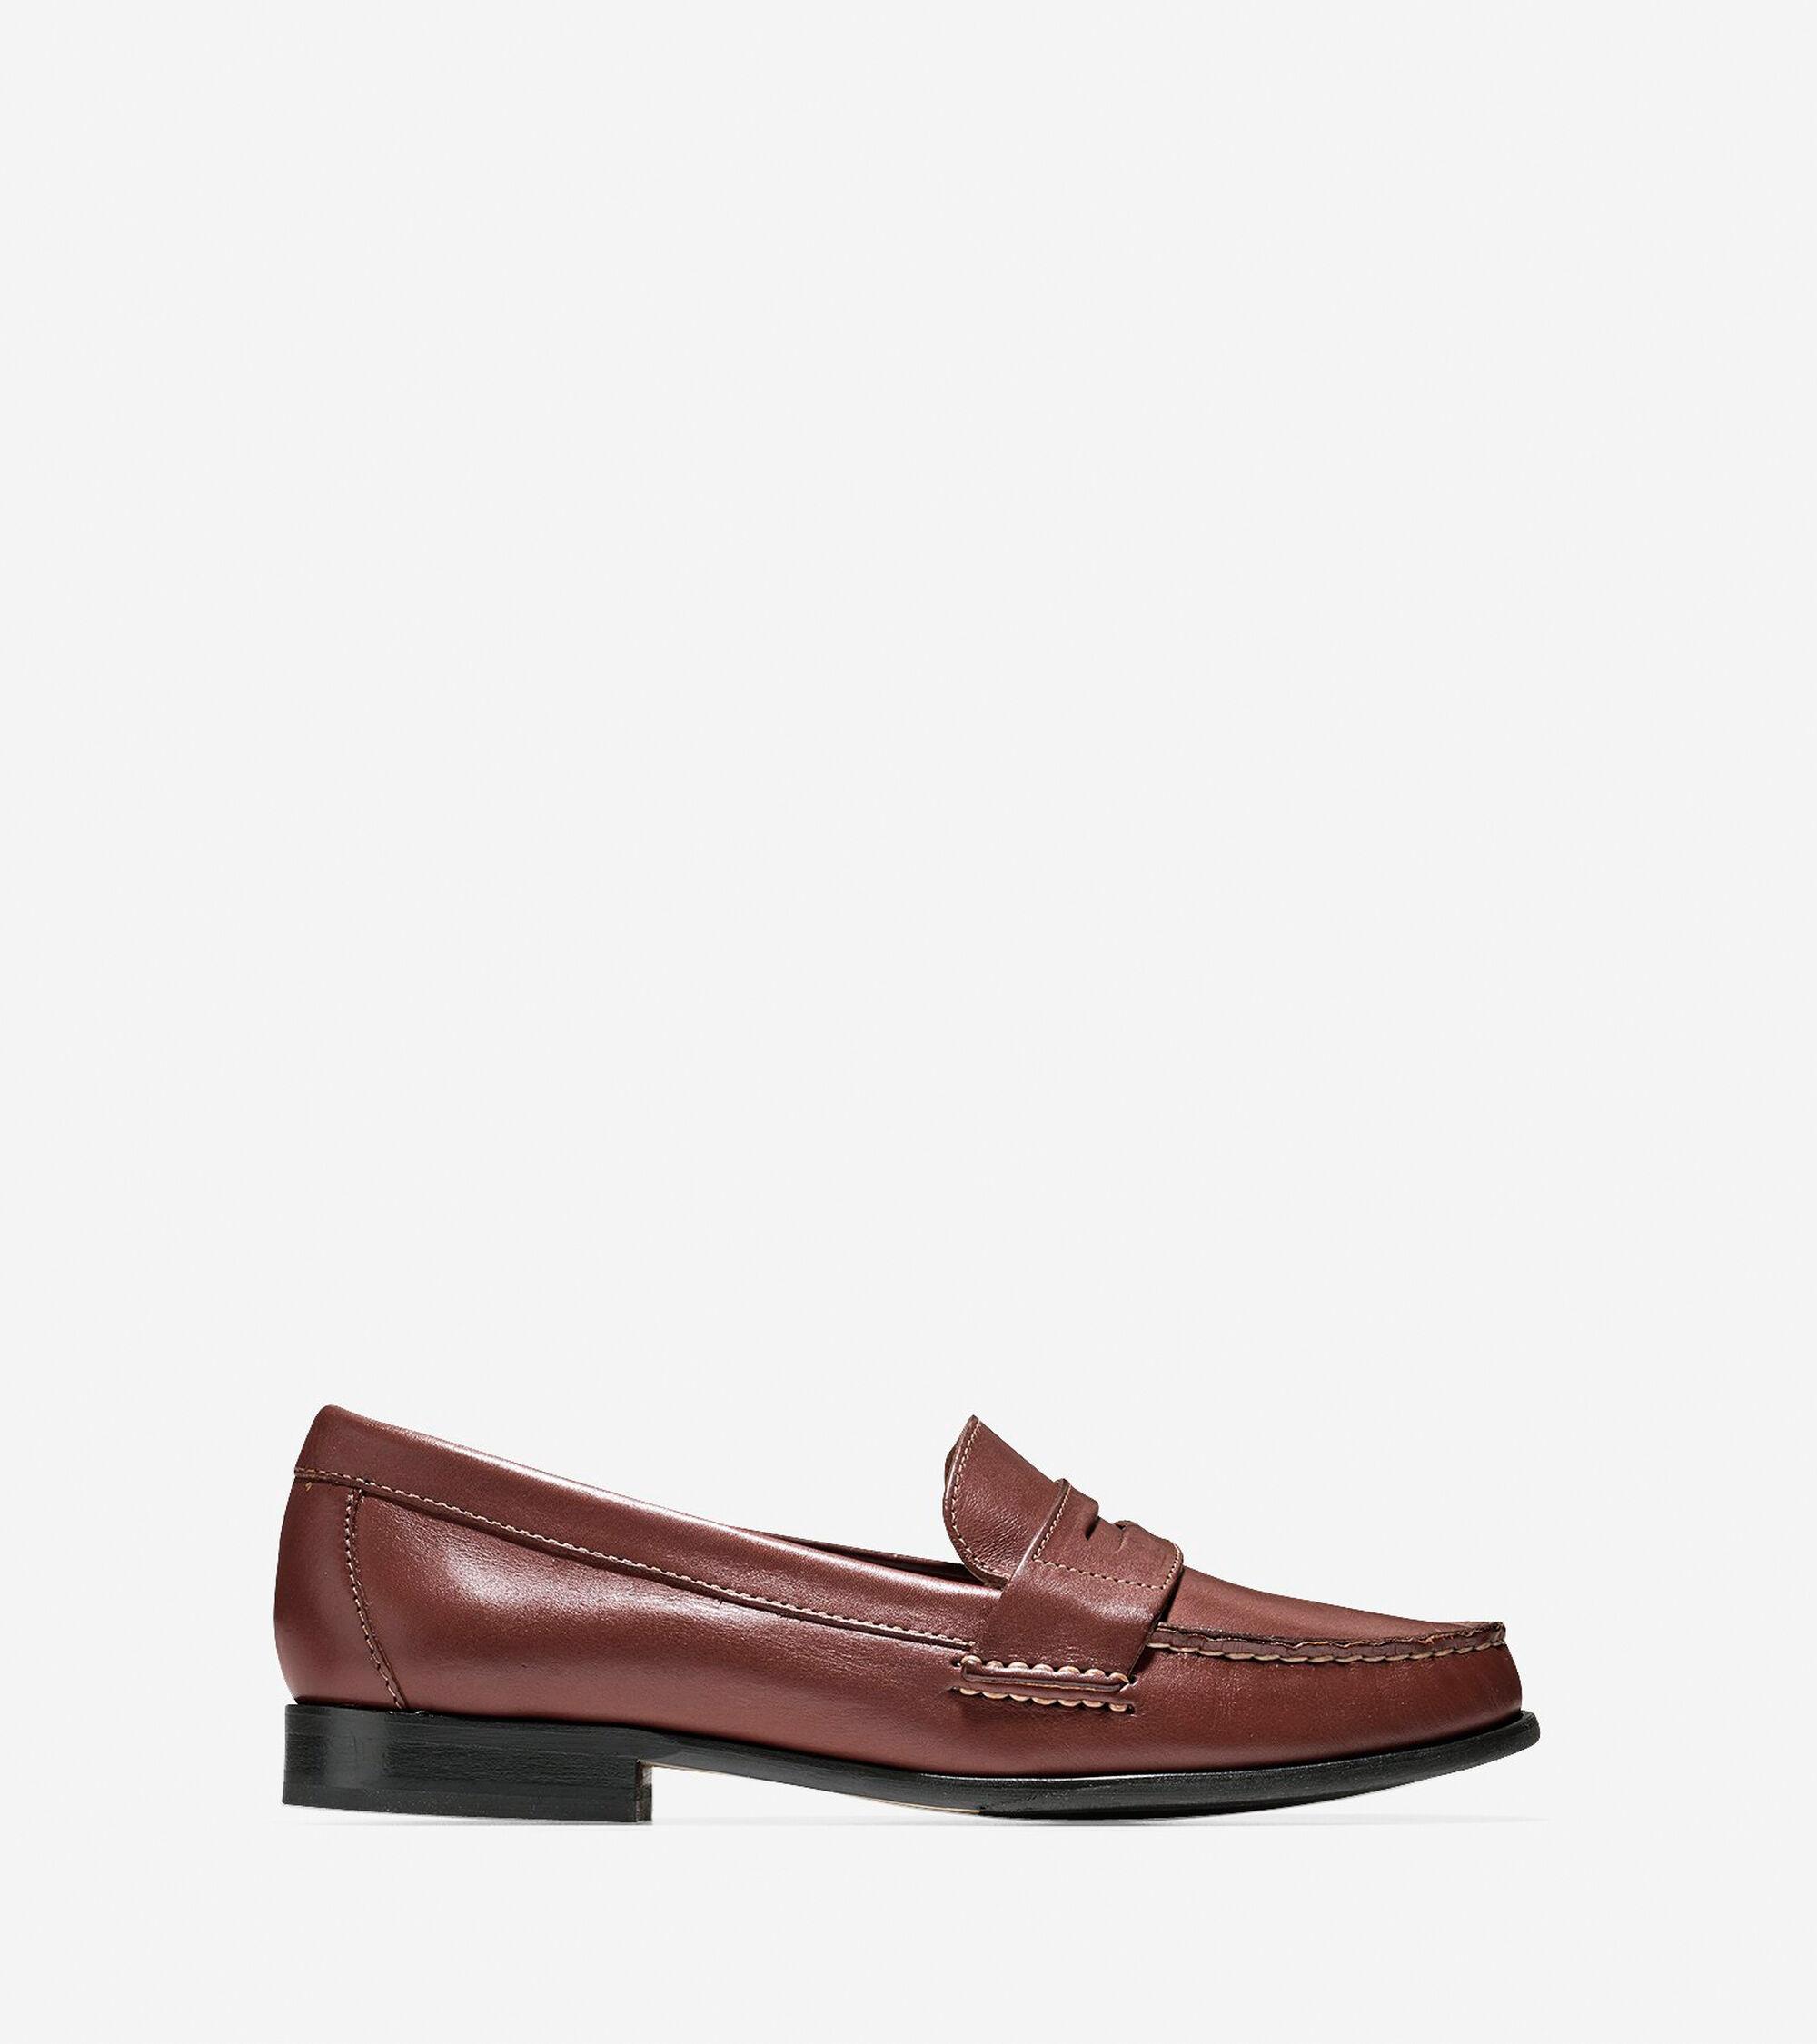 cca699e3ebd Shoes   Alexa Penny Moc. roll-over to zoom